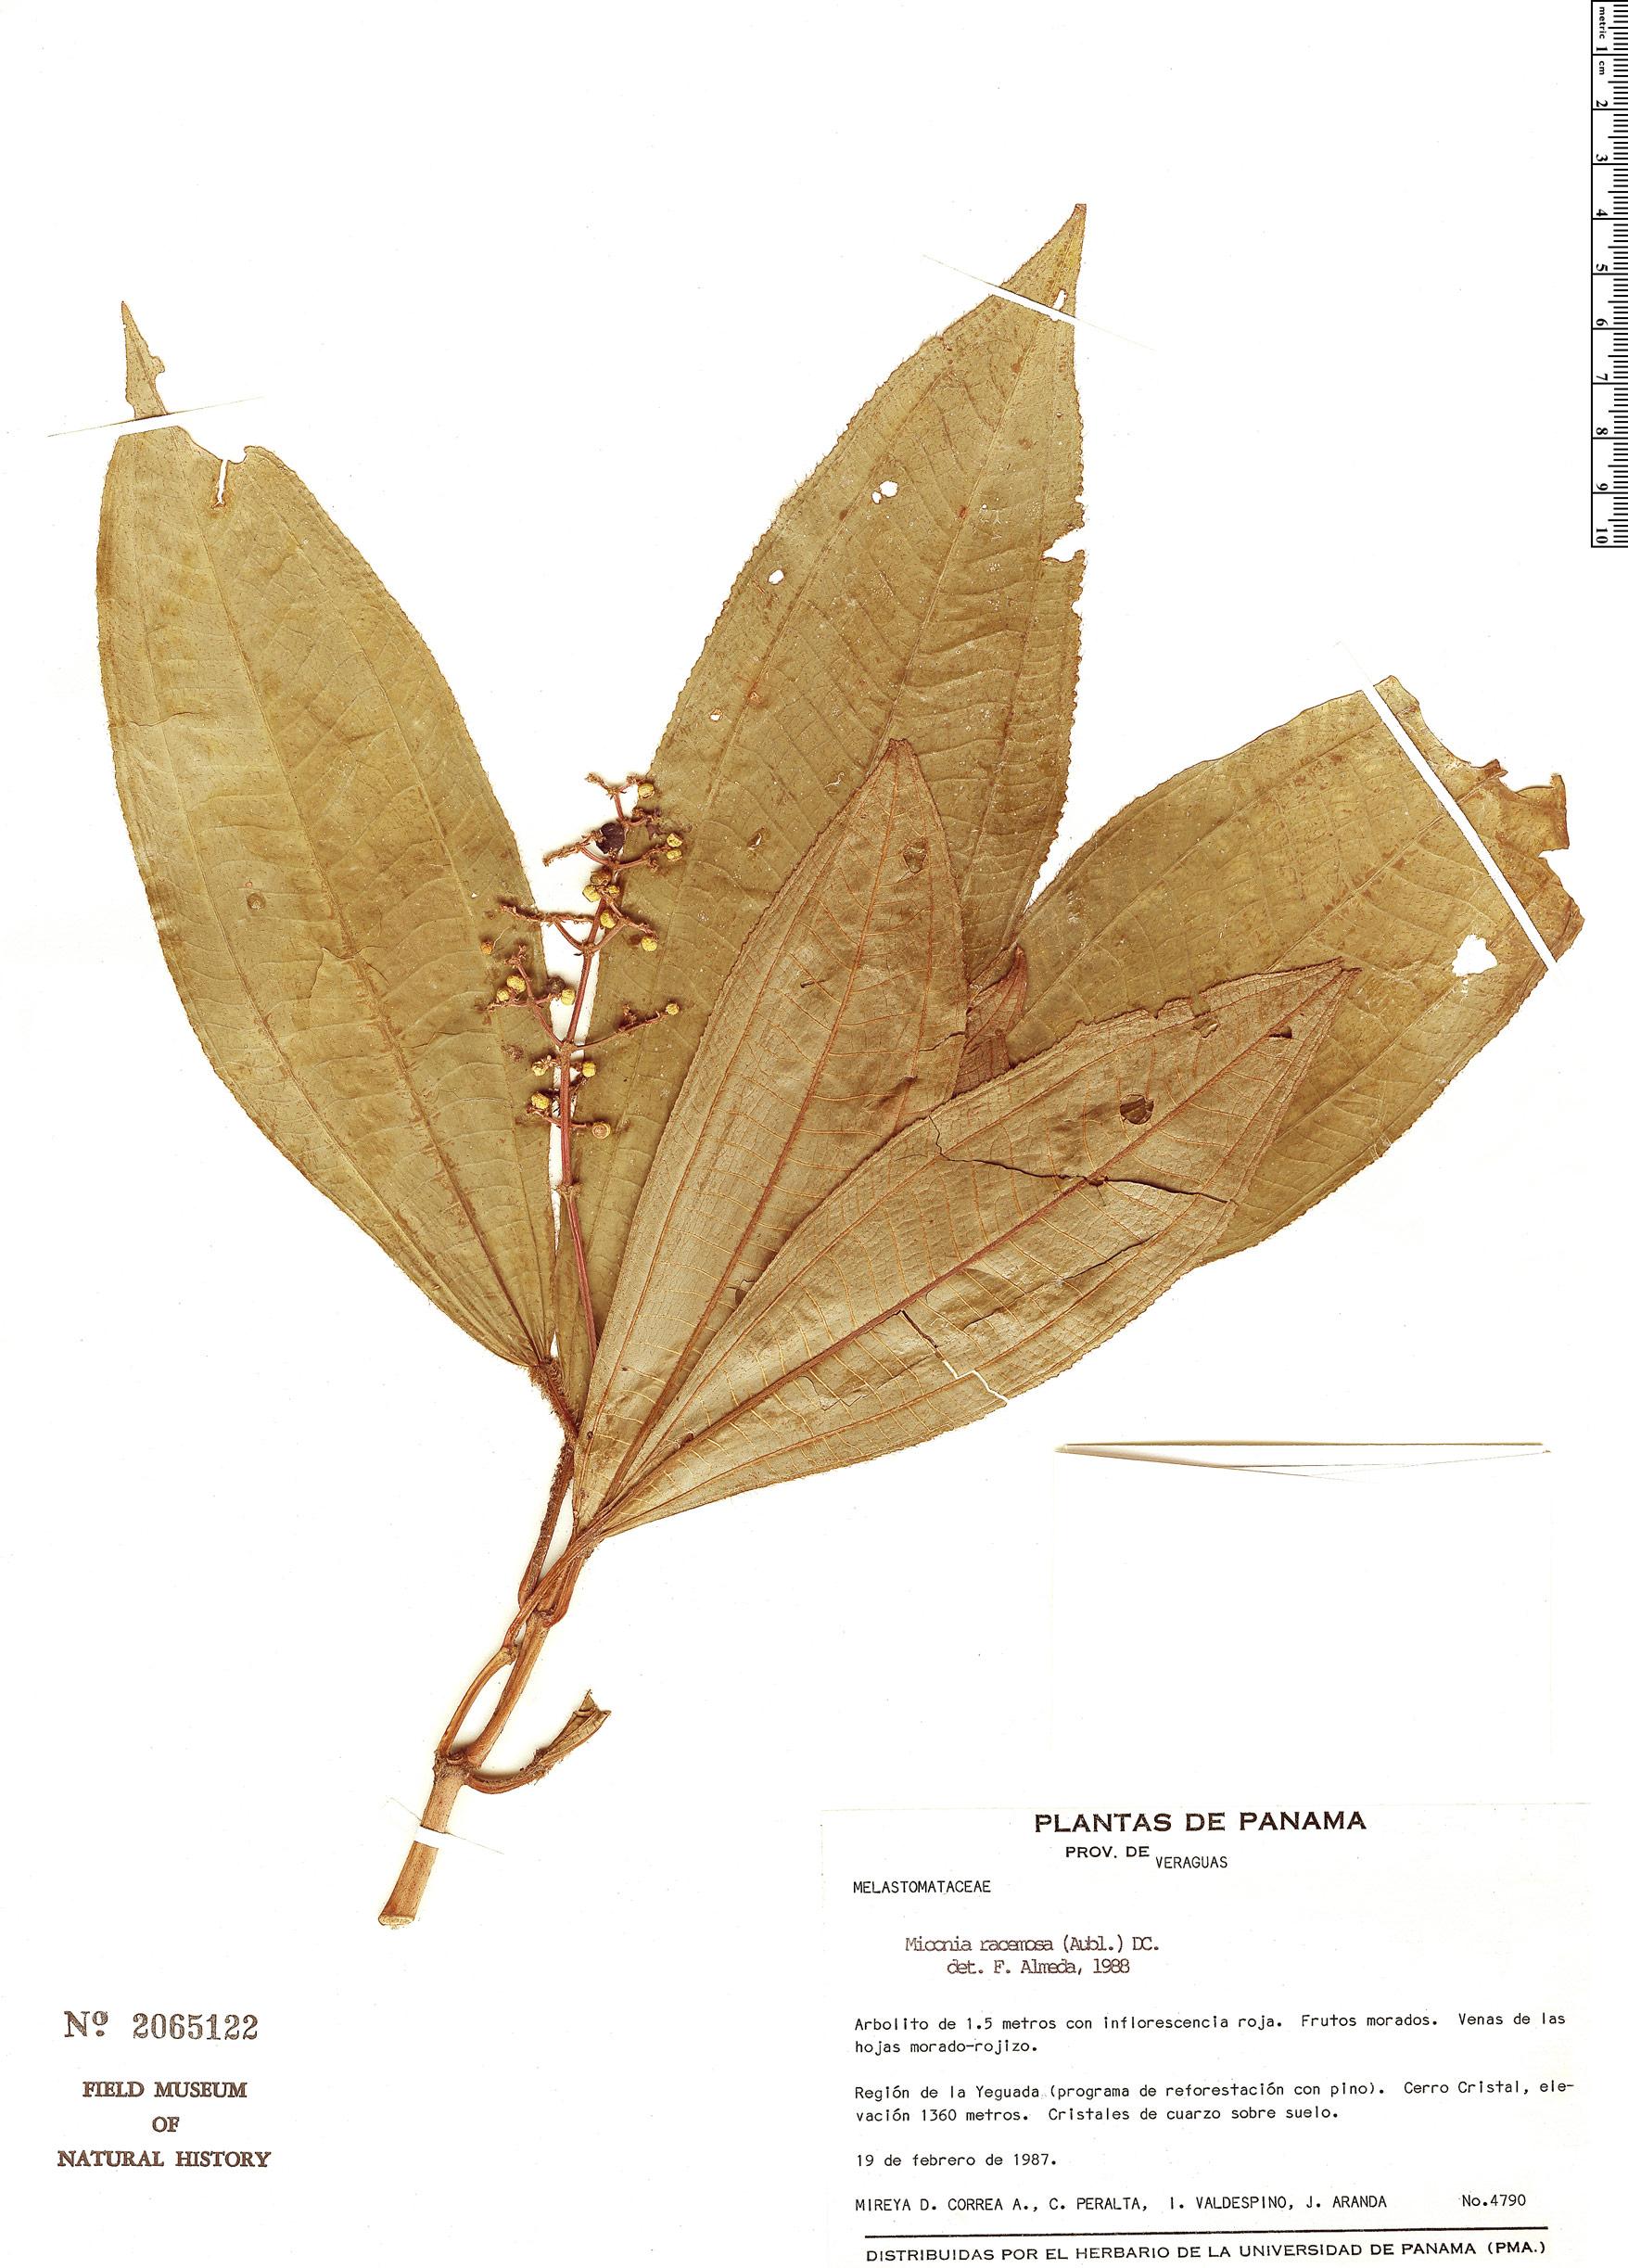 Espécimen: Miconia racemosa